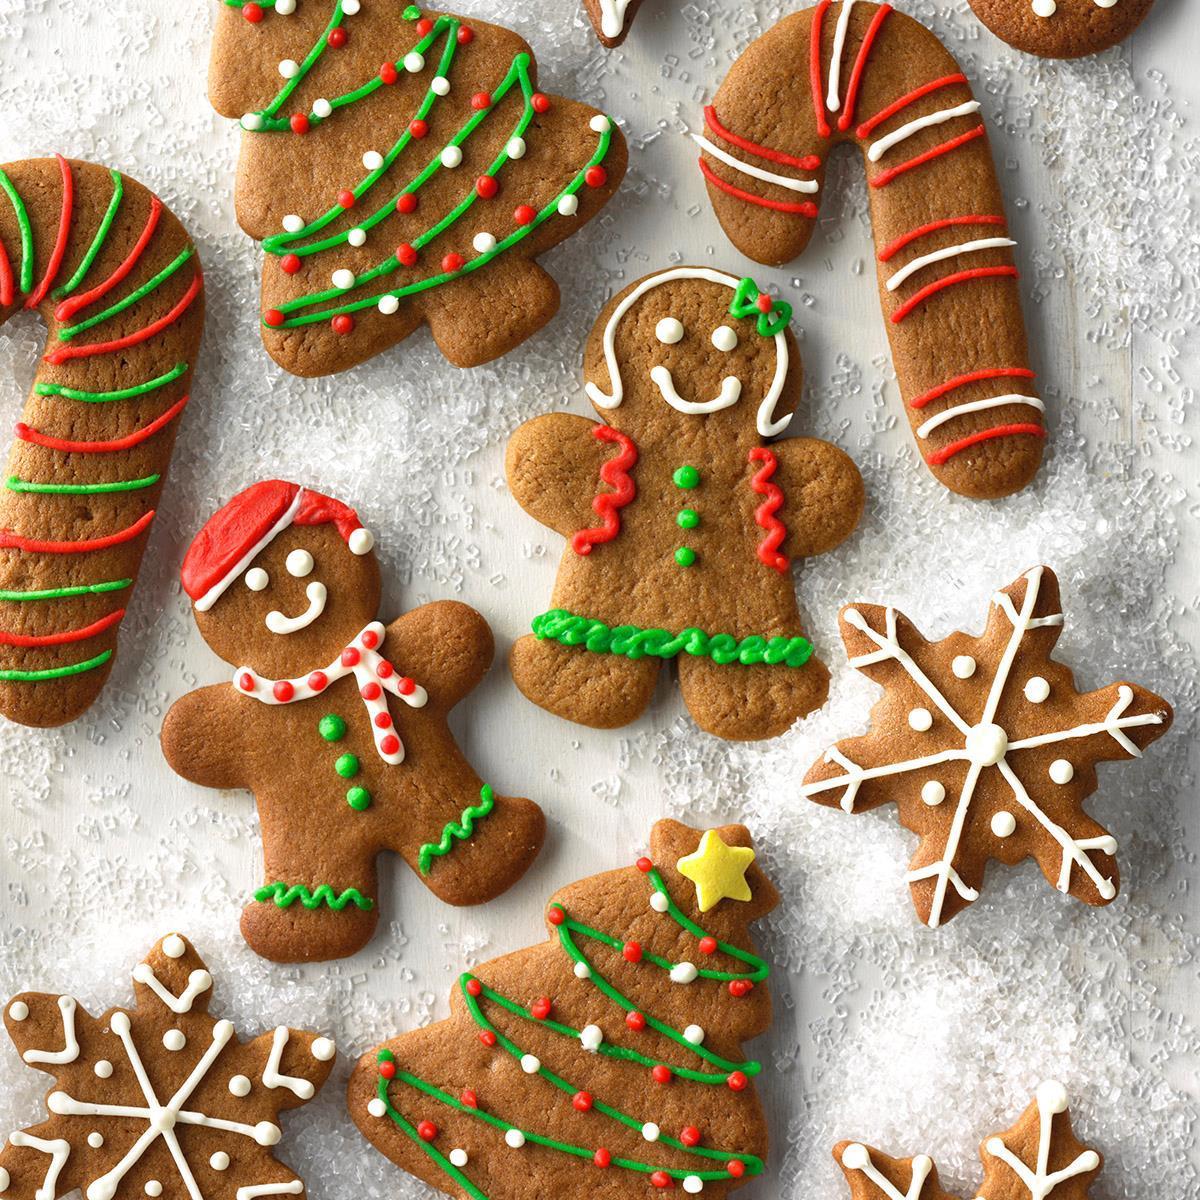 Gingerbread Cutout Cookies cutoutcookierecipe #gingerbreadcookiesrecipe #cutoutcookies #christmasfoodgifts #christmassweets #christmascooking #xmas #howtomakegingerbread #gingerbreadcookies